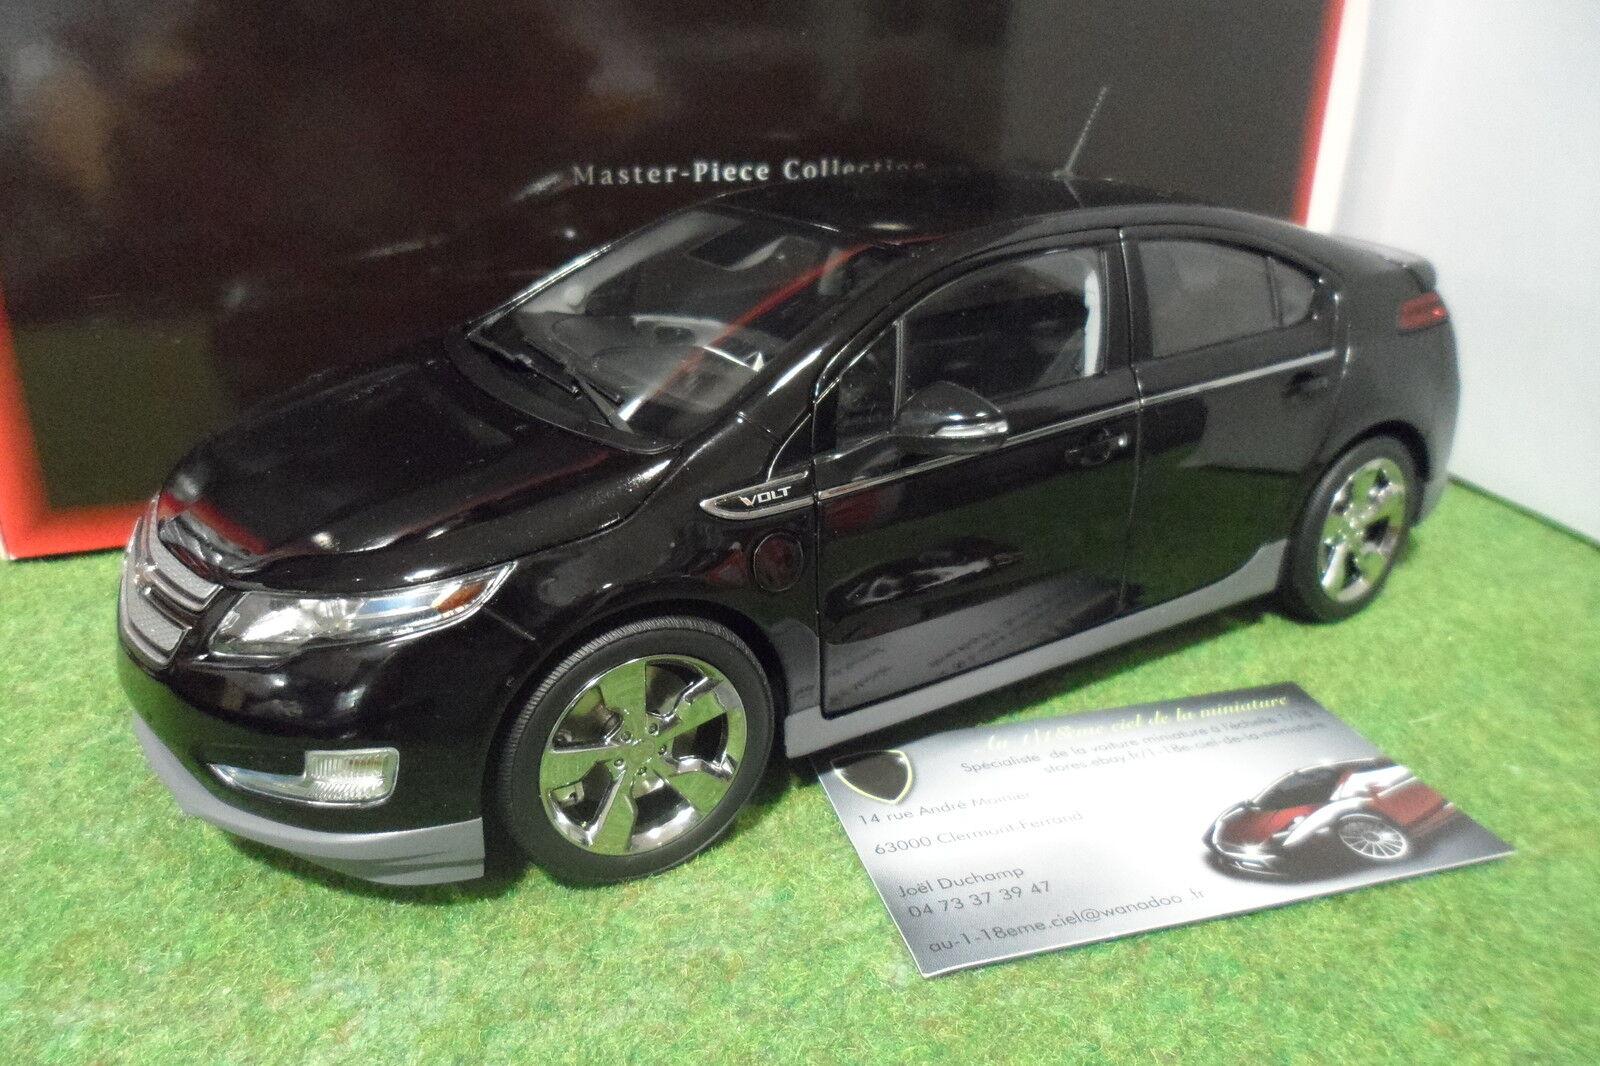 CHEVROLET VOLT noir 1 18 KYOSHO MASTER PIECE G004BK voiture miniature collection